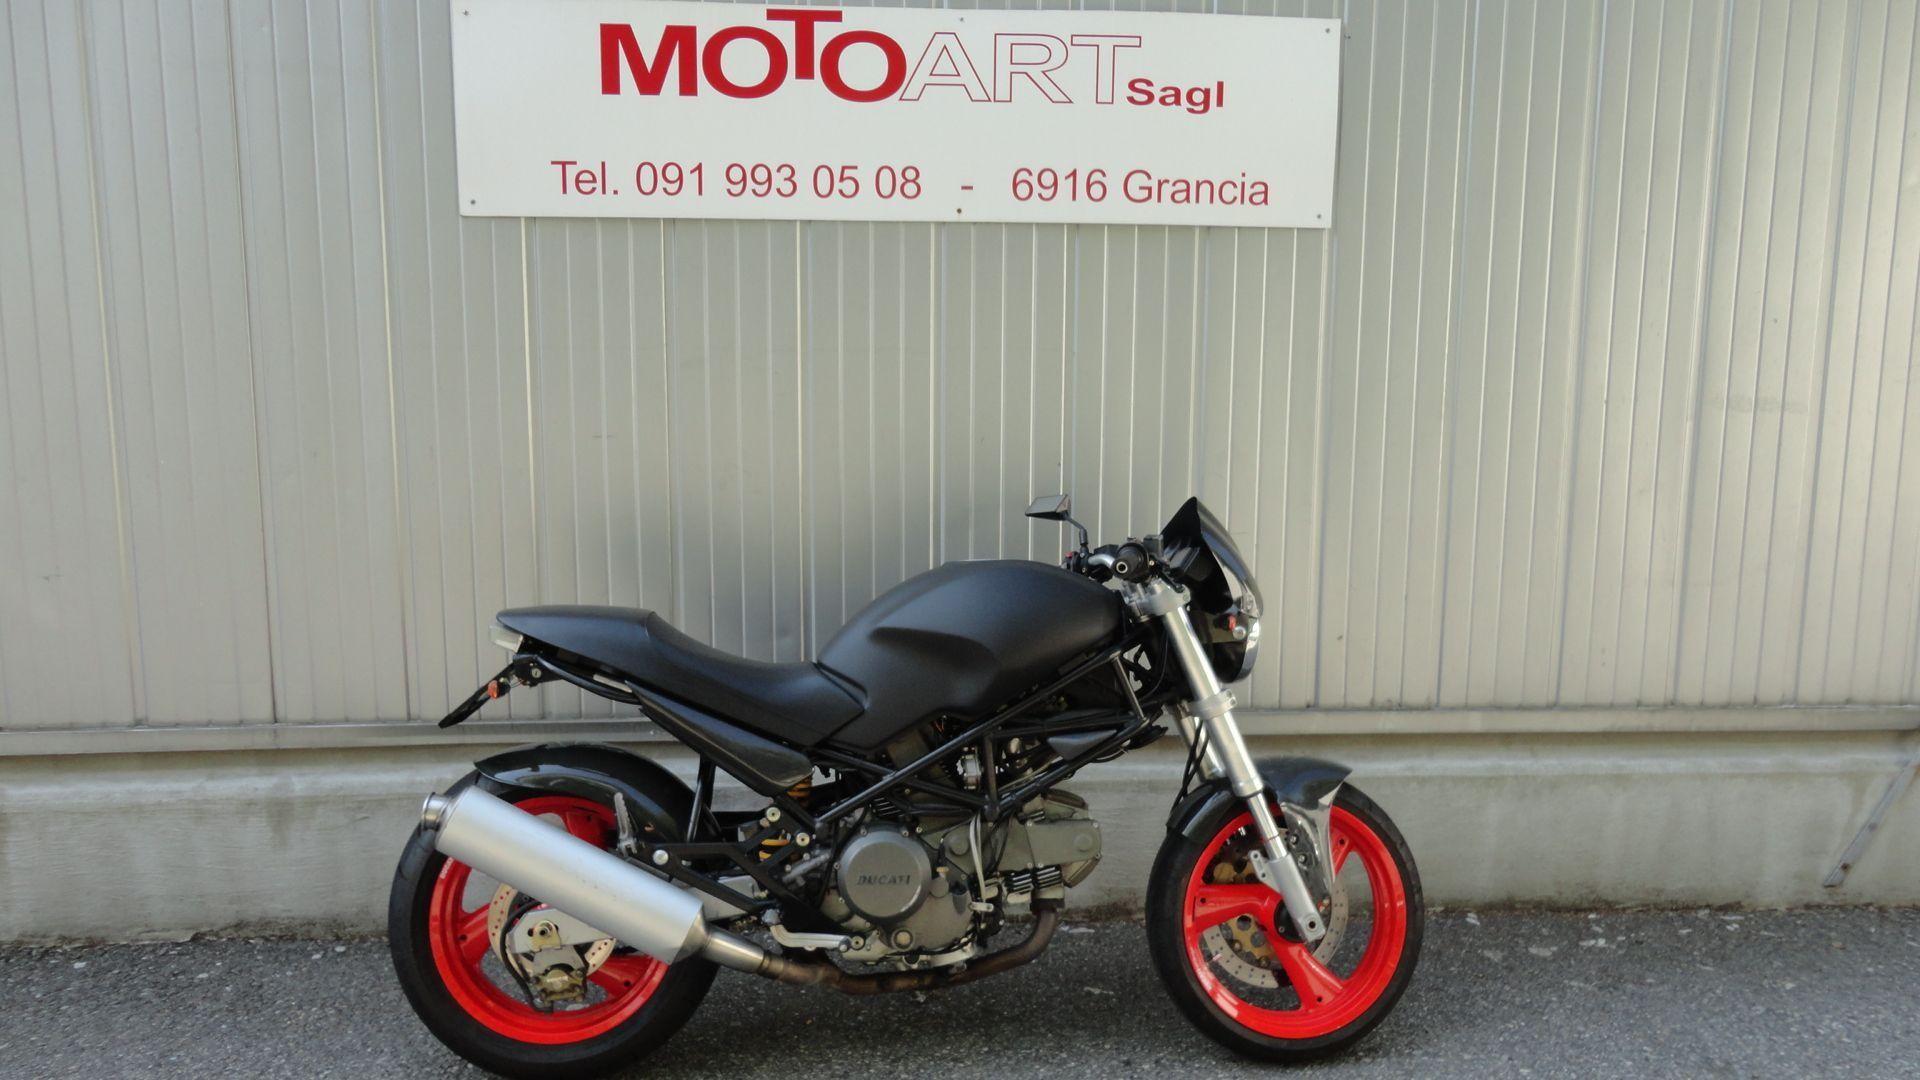 motorrad occasion kaufen ducati 600 monster 46 moto art sagl grancia. Black Bedroom Furniture Sets. Home Design Ideas